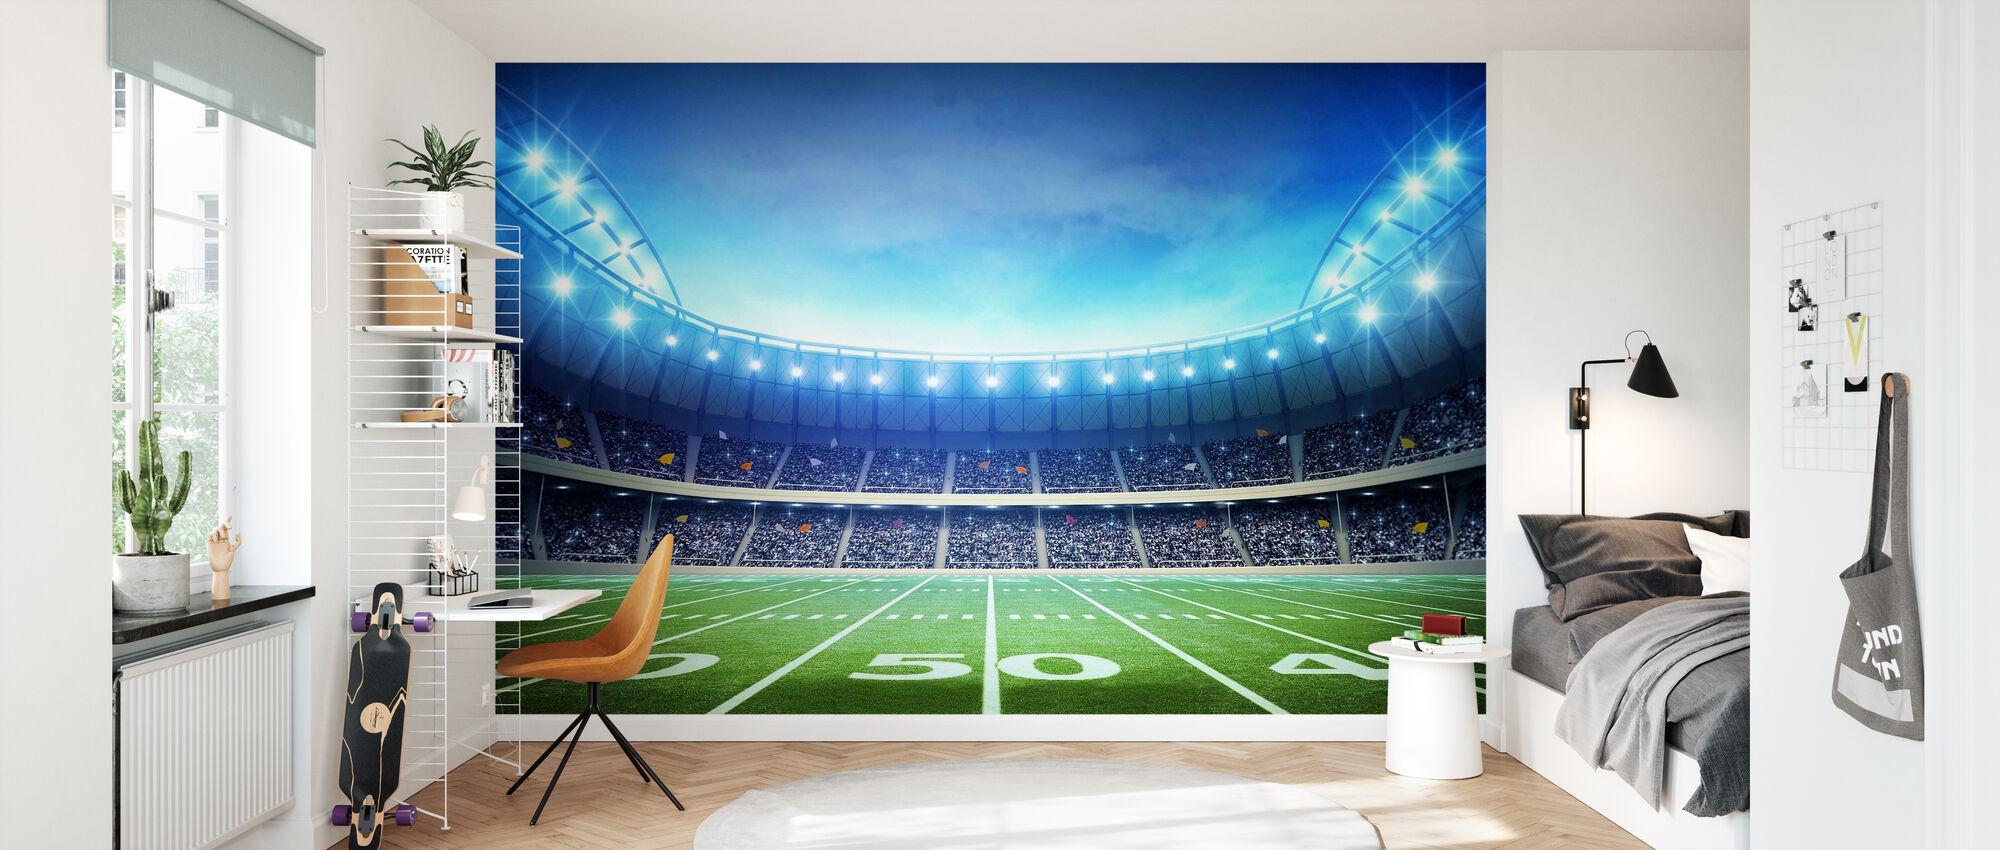 Light of American Stadium - Wallpaper - Kids Room